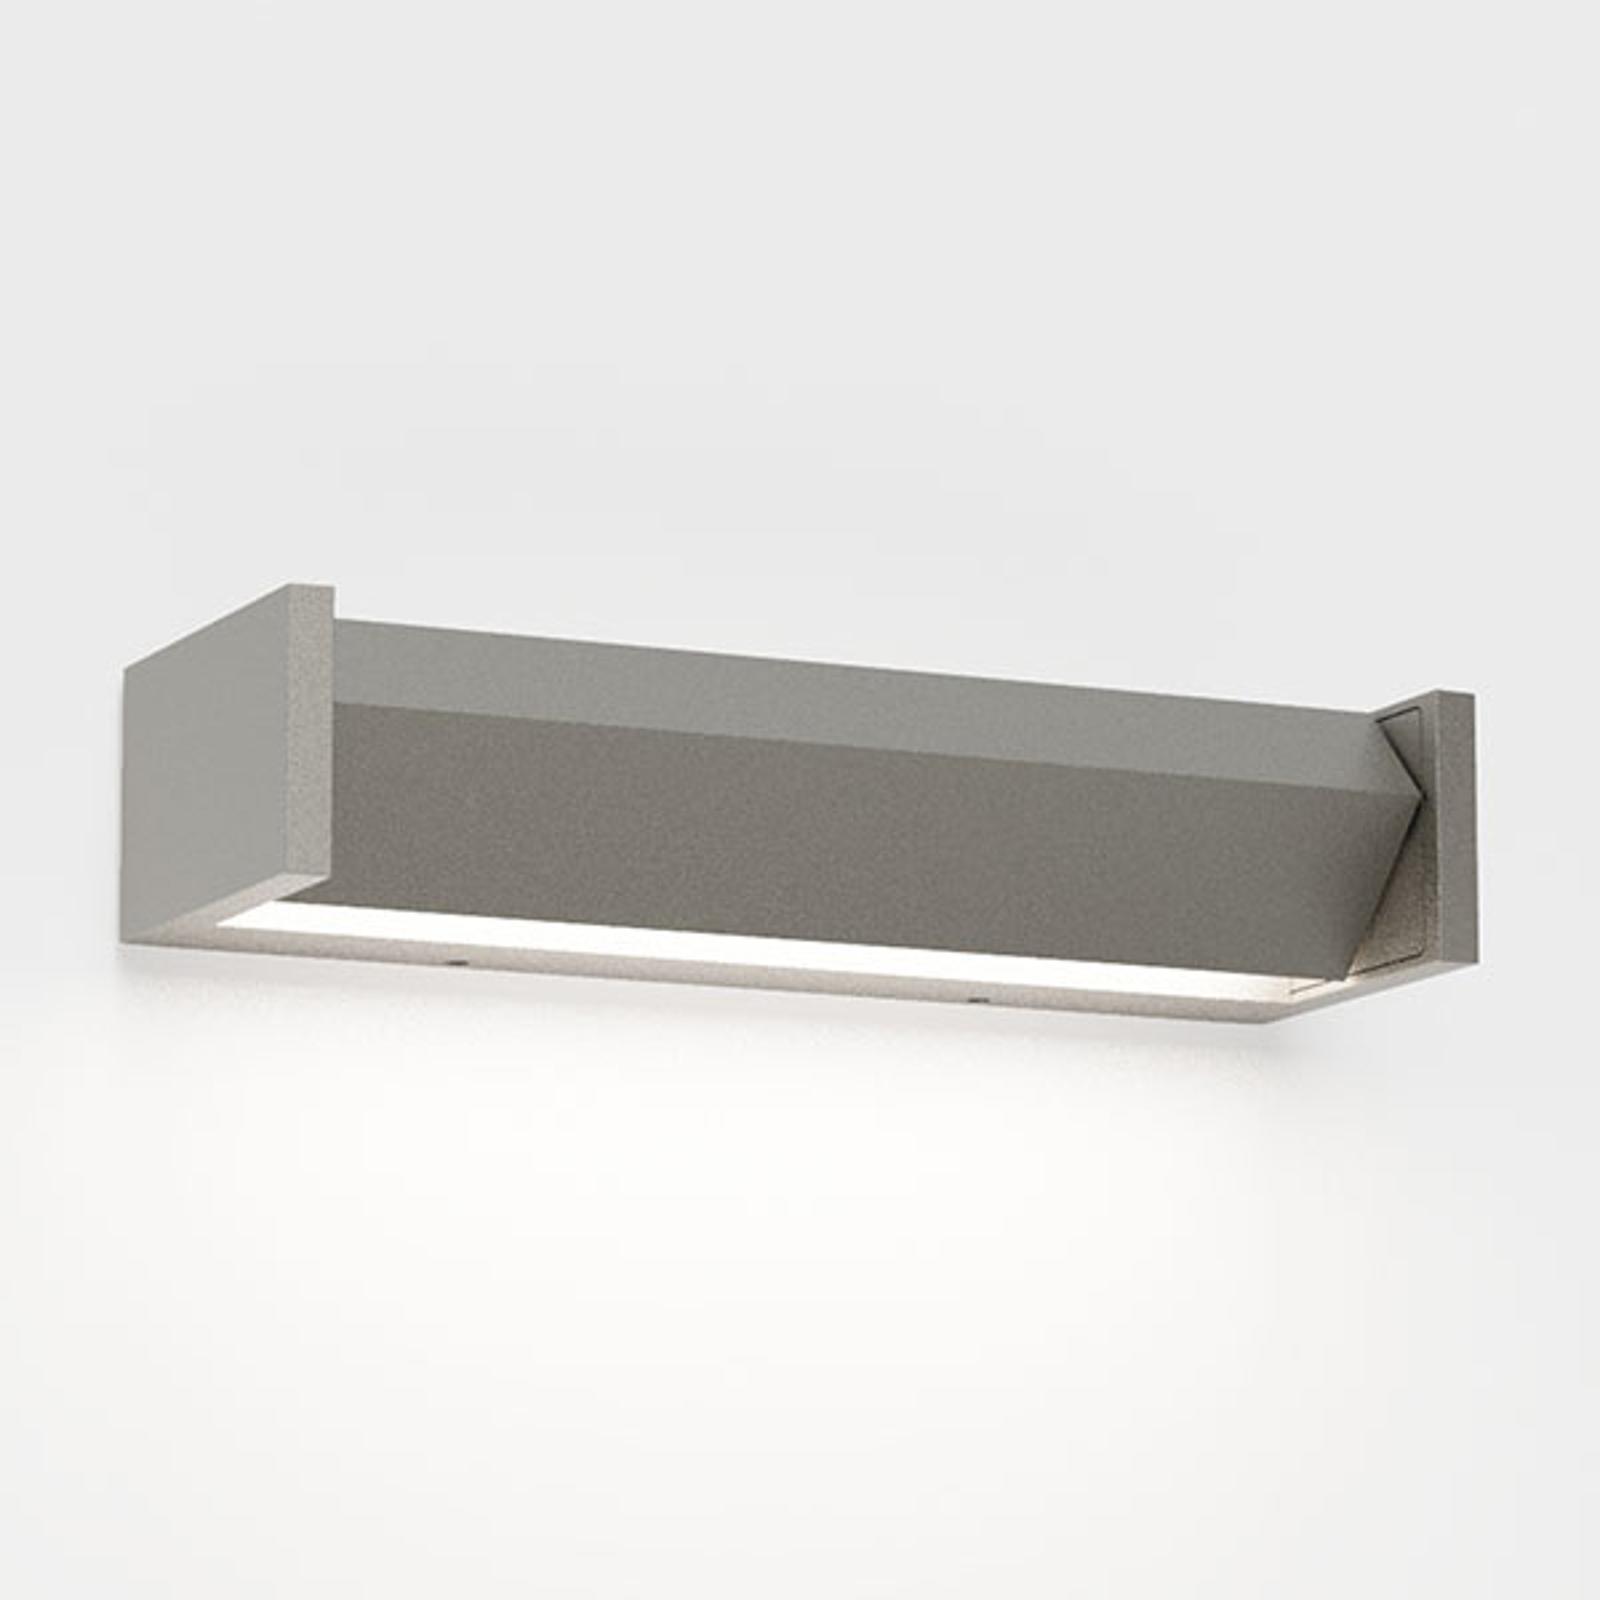 IP44.de Slat One LED-Außenwandleuchte, grau